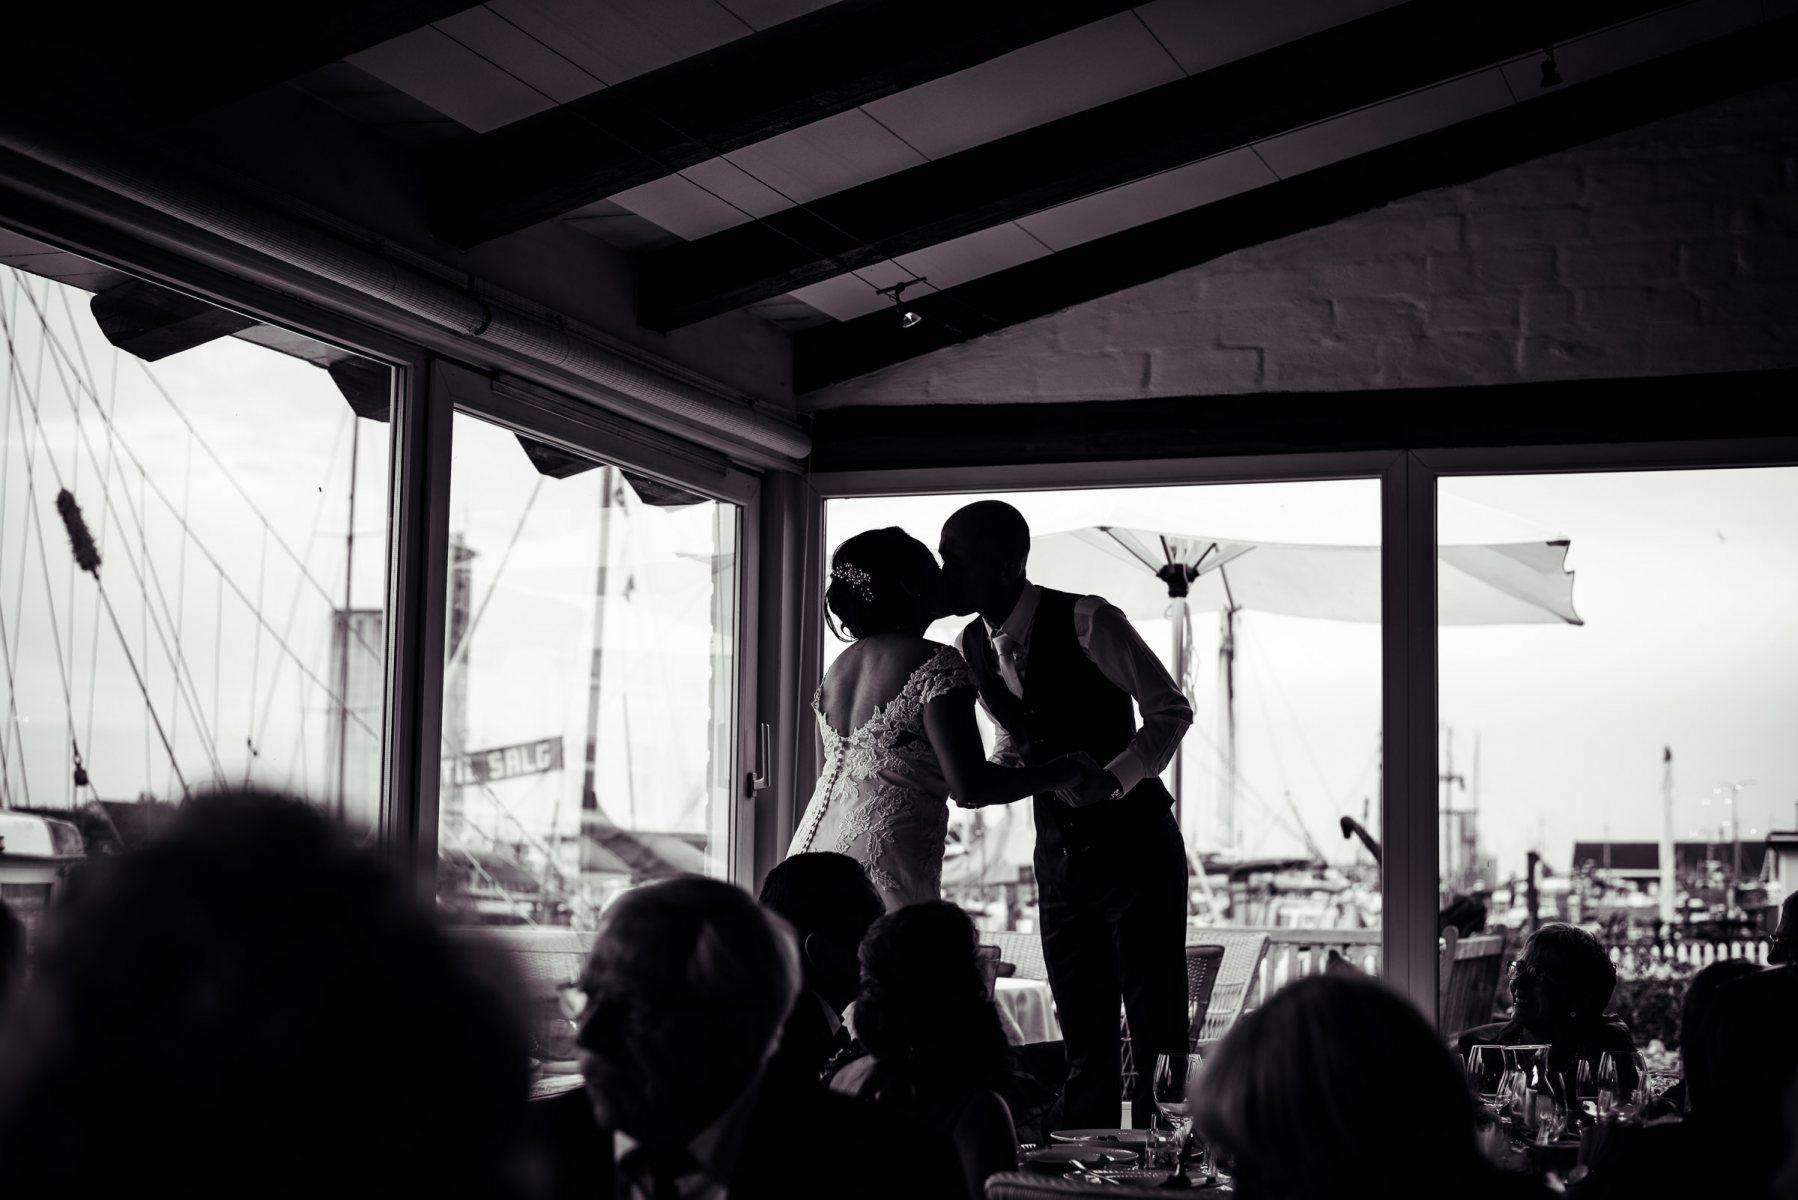 brudepar kysser i festsal. Bryllupsfoto